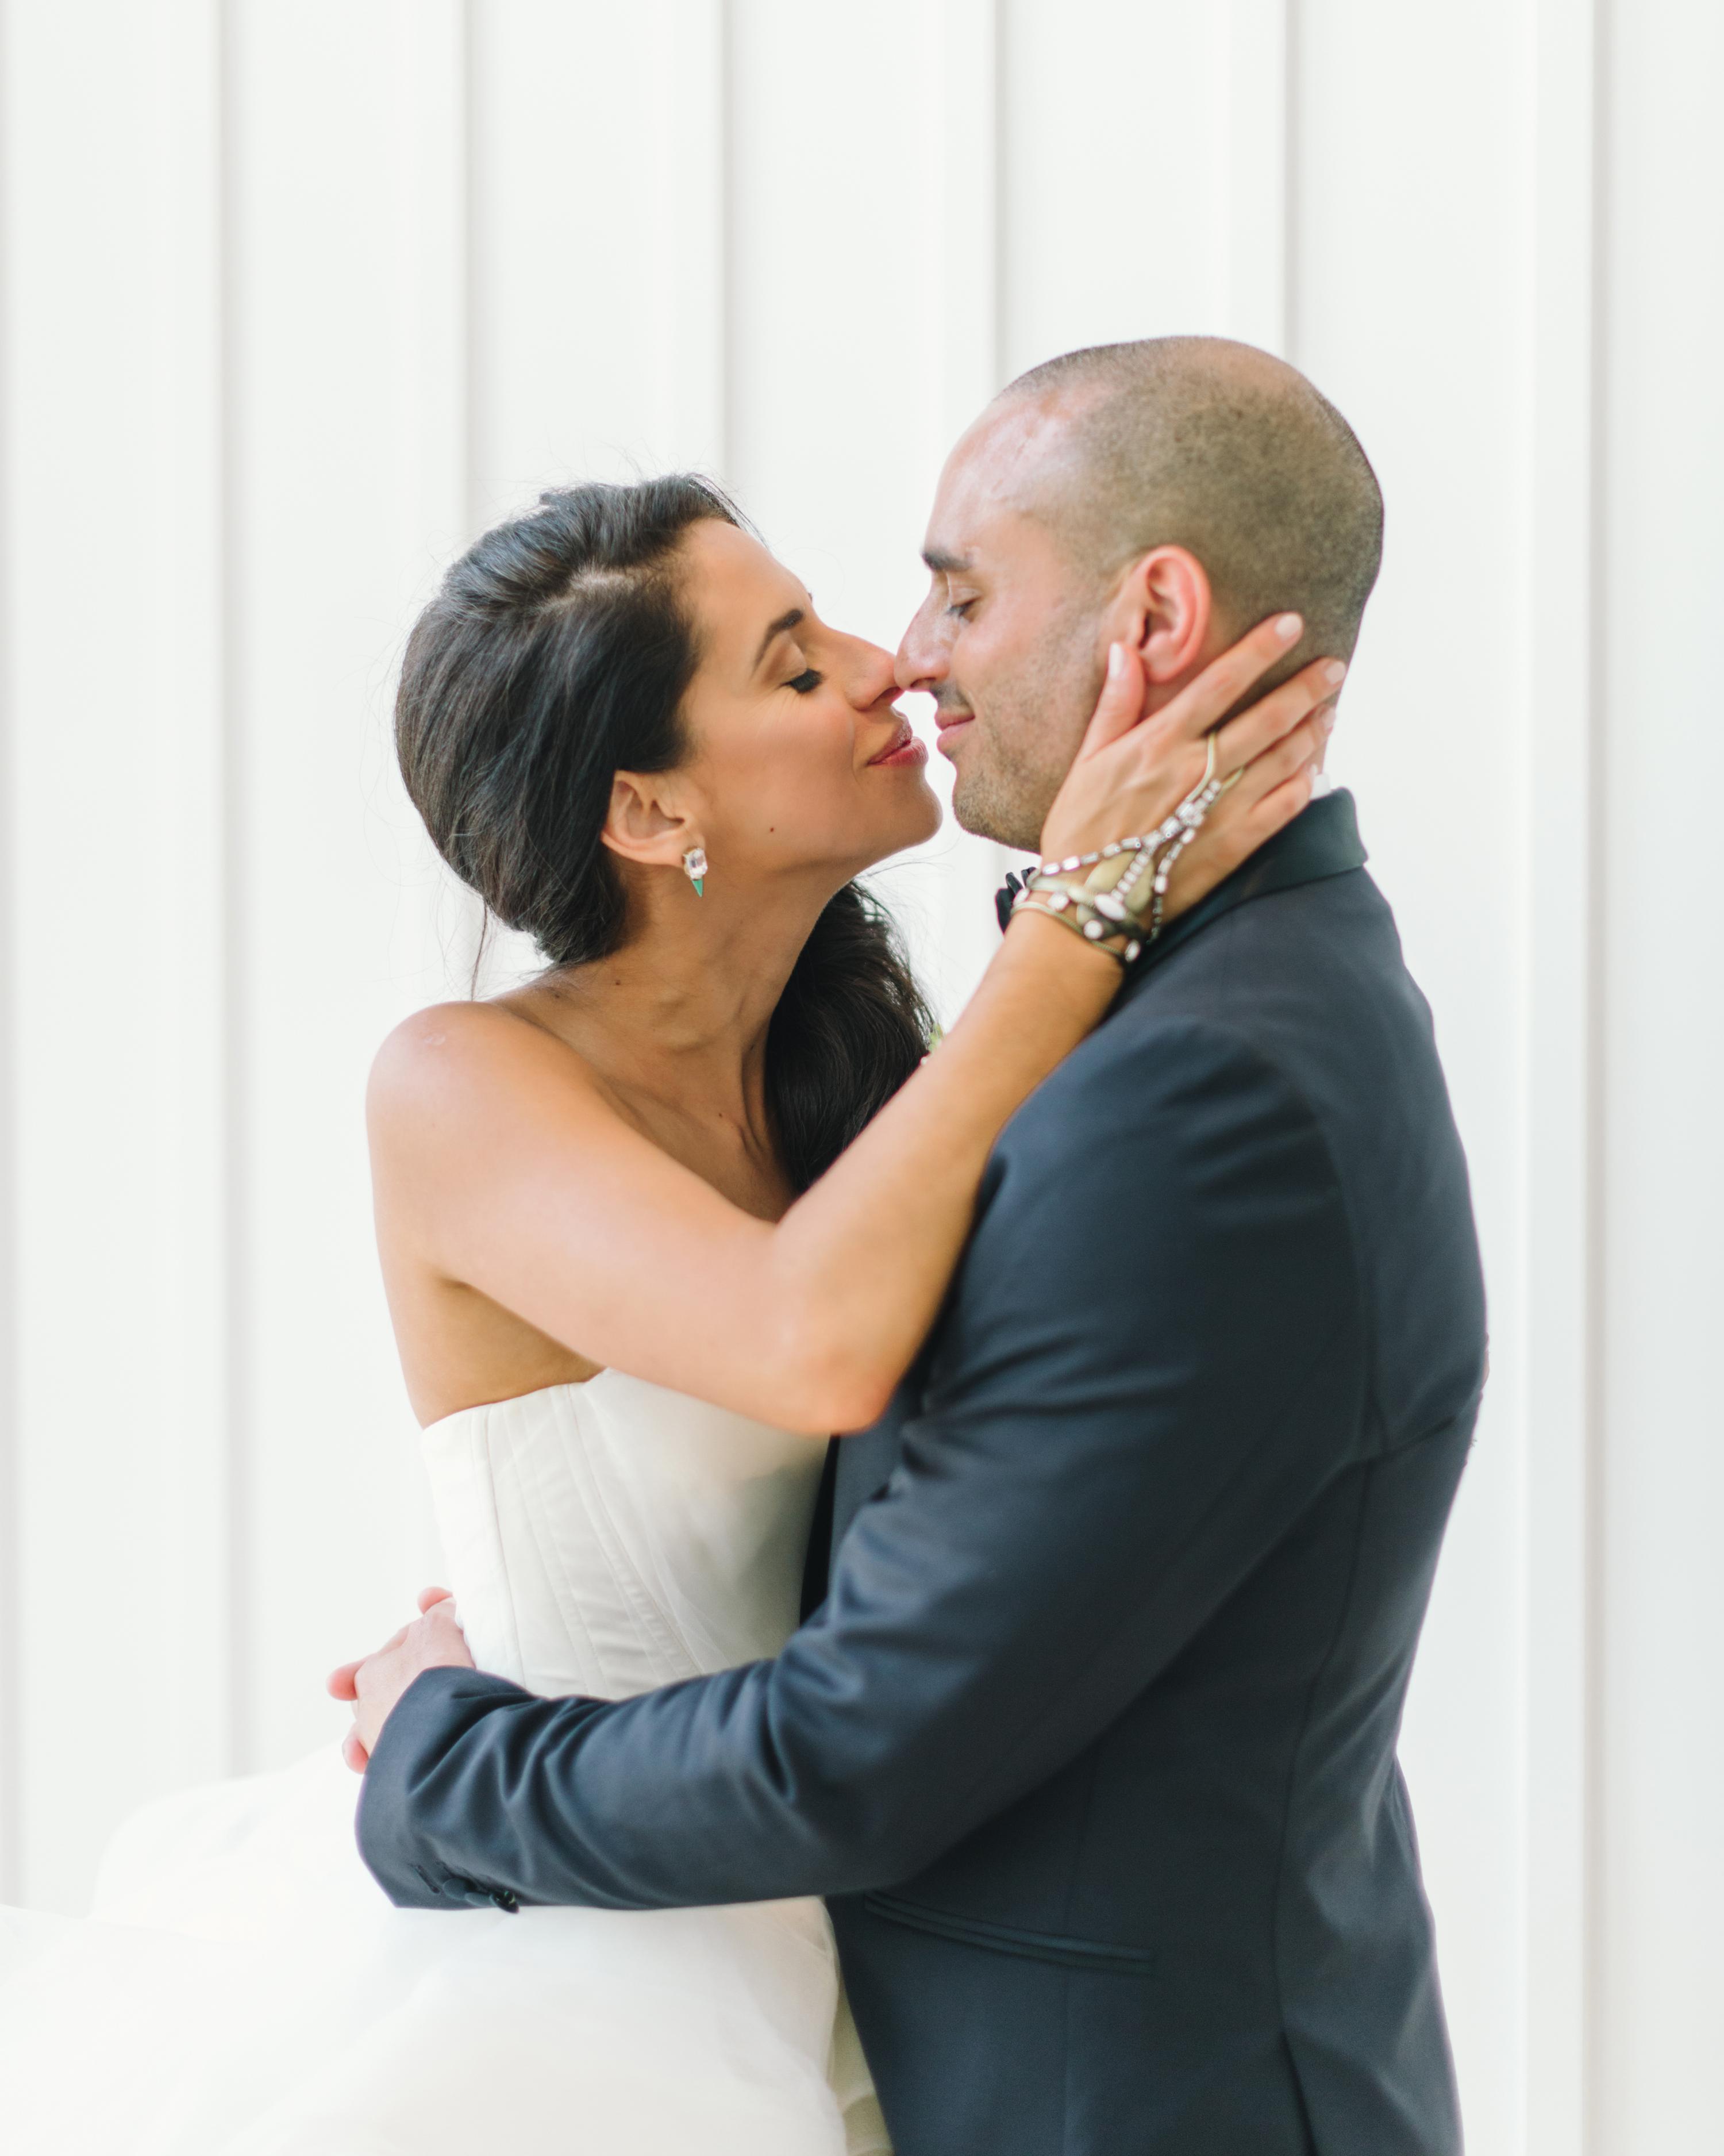 vanessa-joe-wedding-couple-8142-s111736-1214.jpg